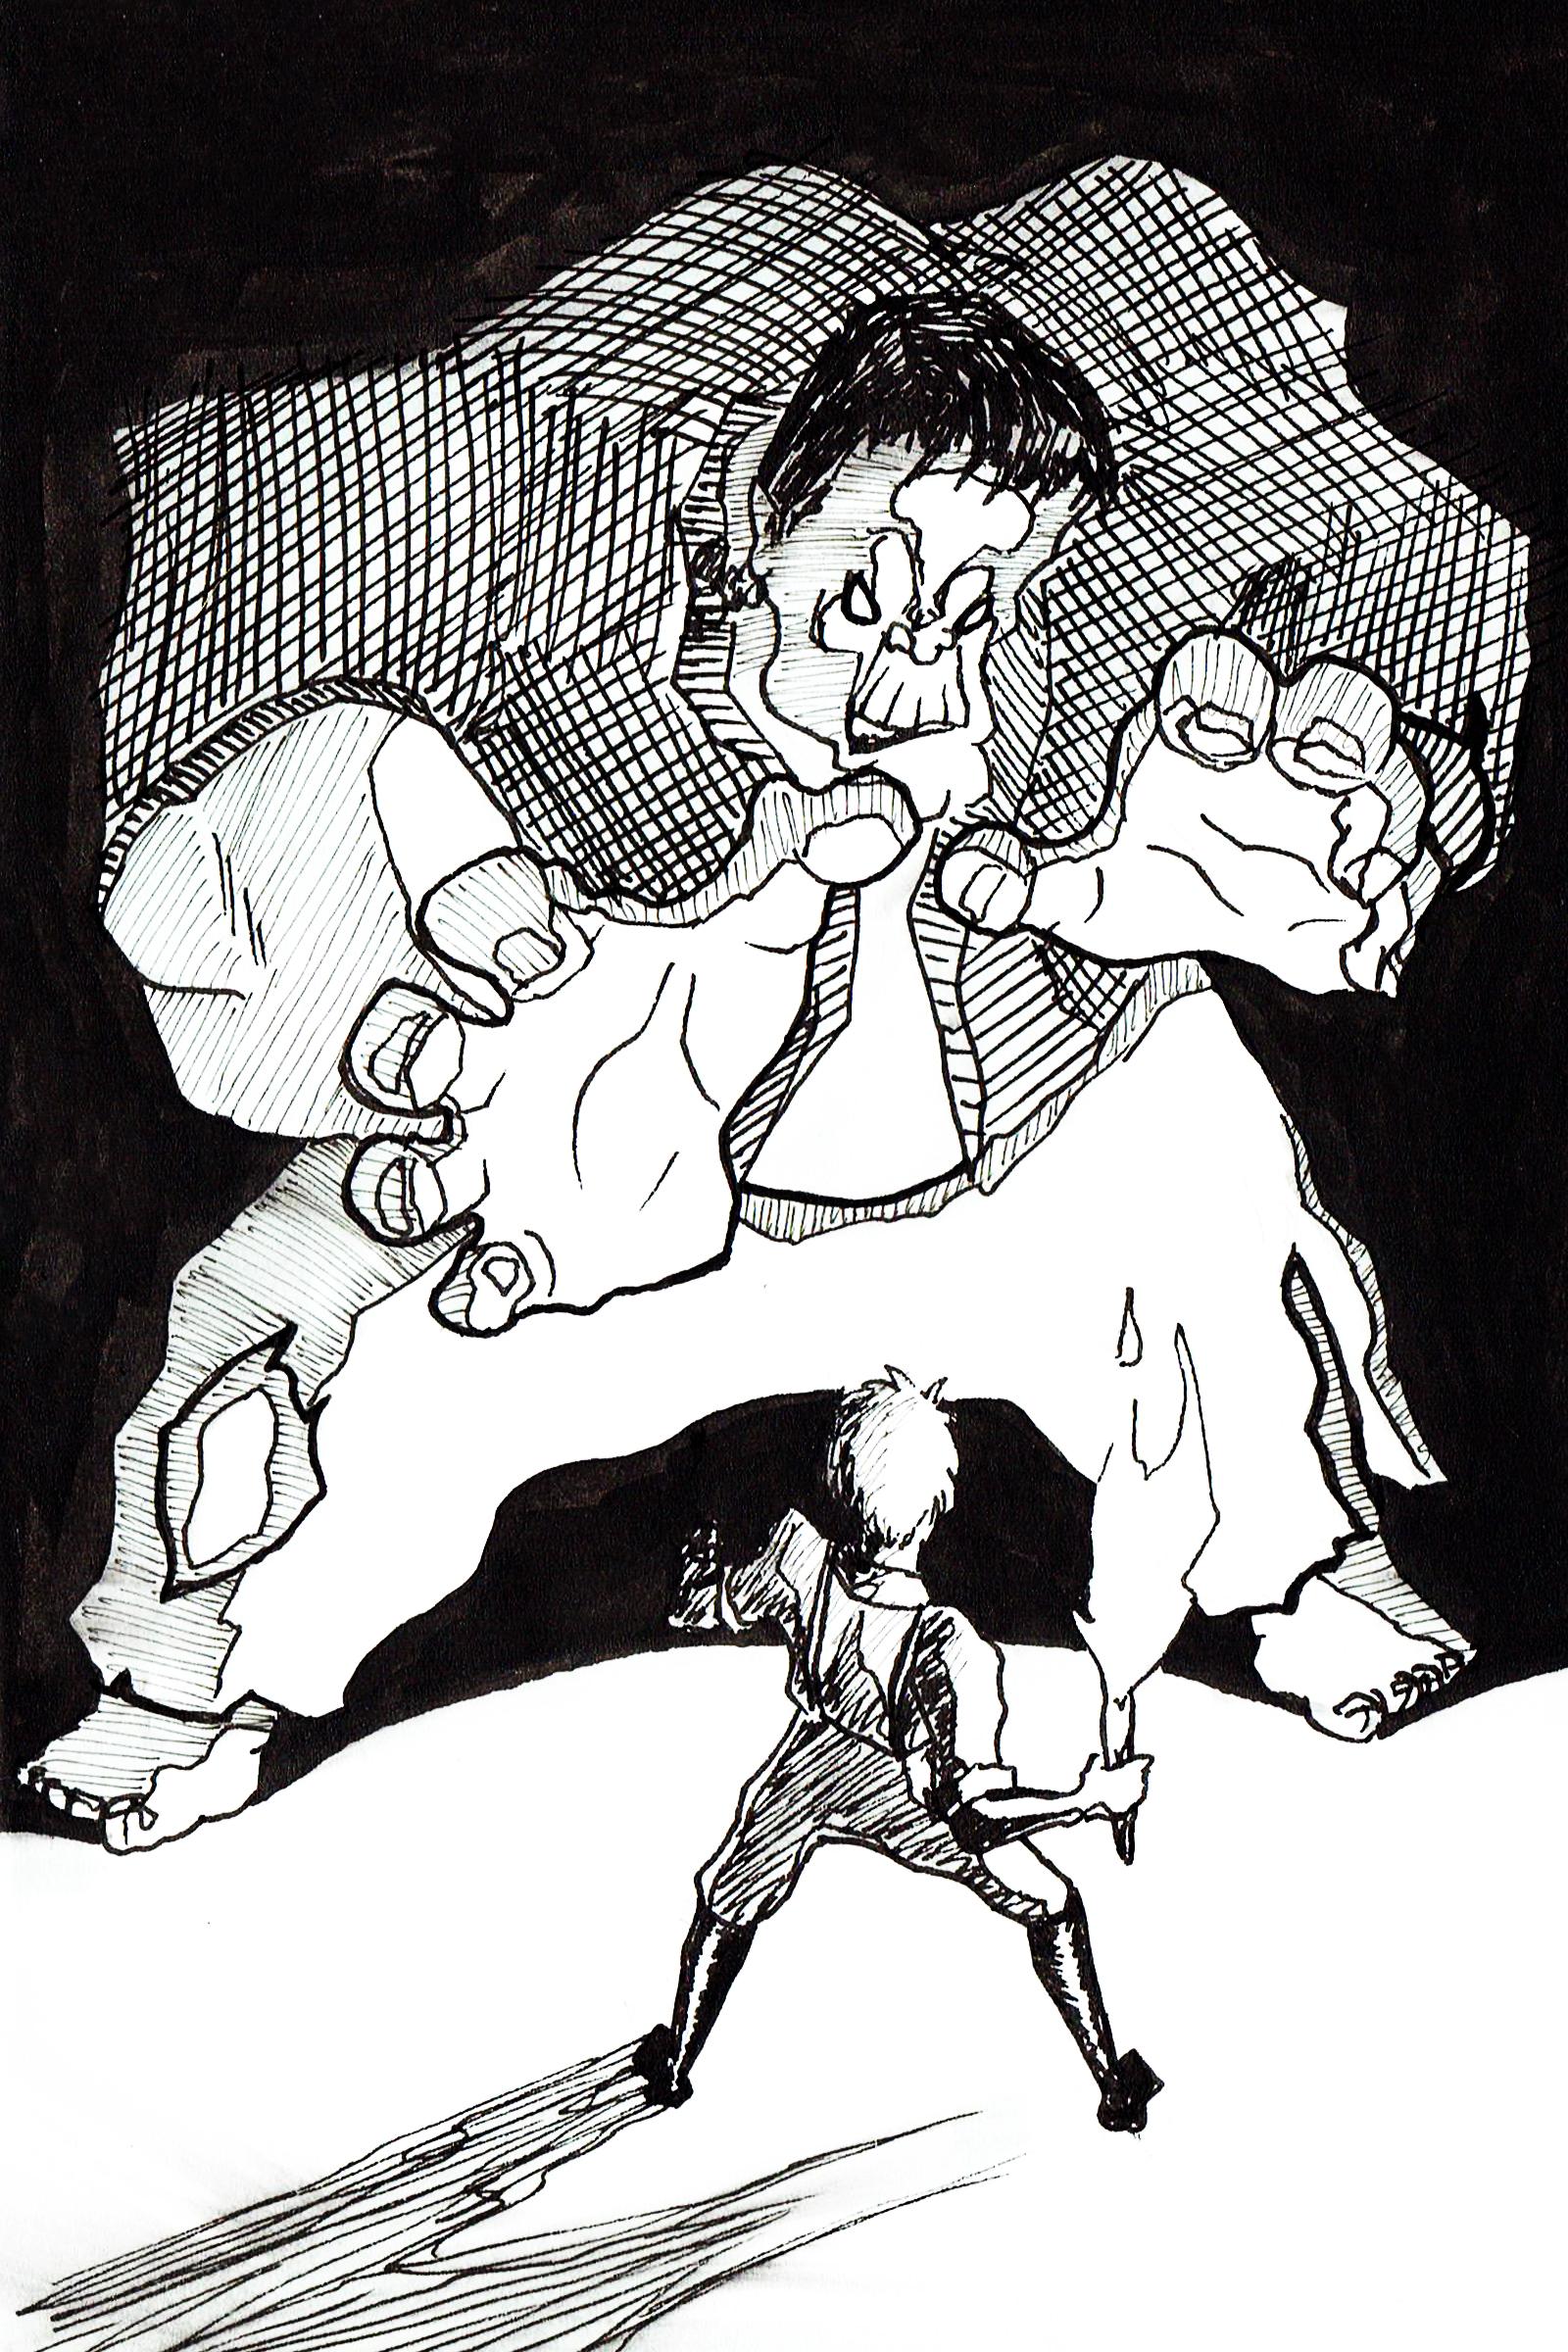 Frankenstein in the Dark Ink Drawing